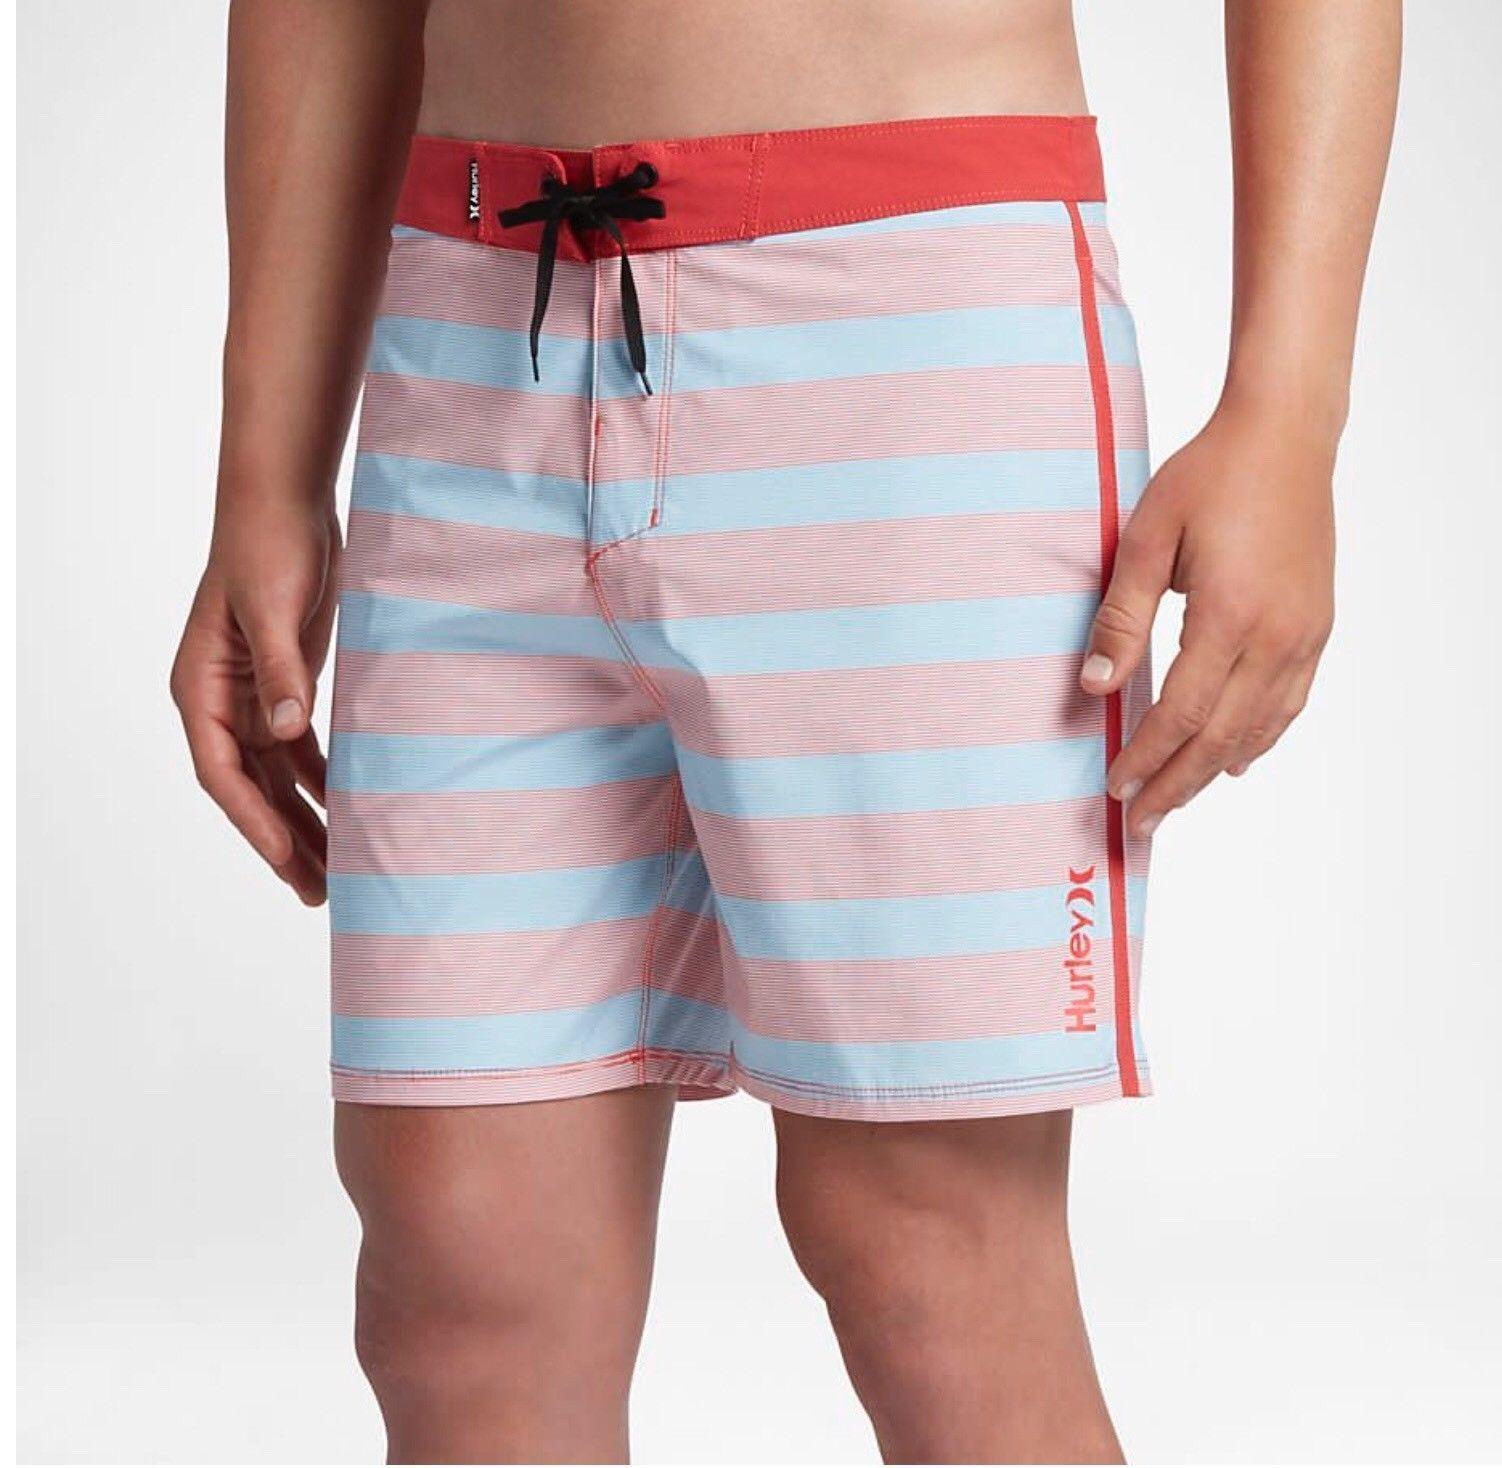 Hurley Men's Size 40 Beachside Windsor 18  Boardshorts MBS0007460 6FX